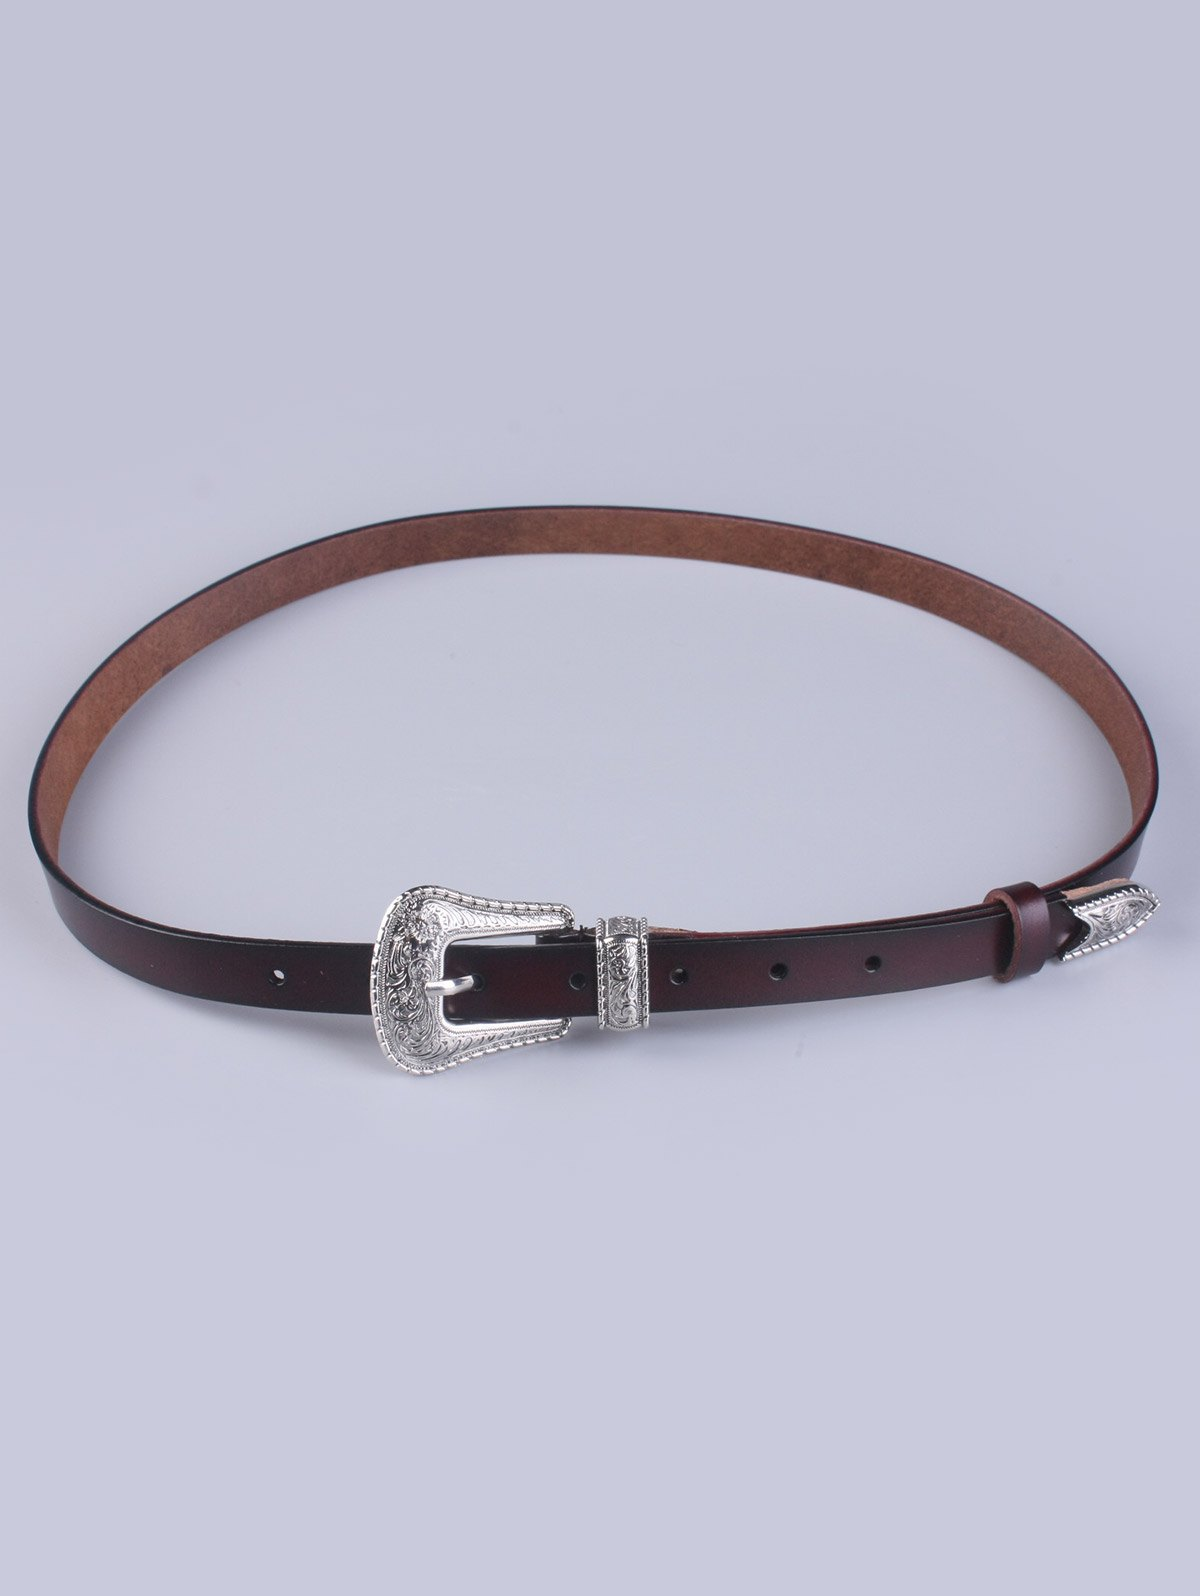 Vintage Pin Buckle Faux Leather Waist Belt